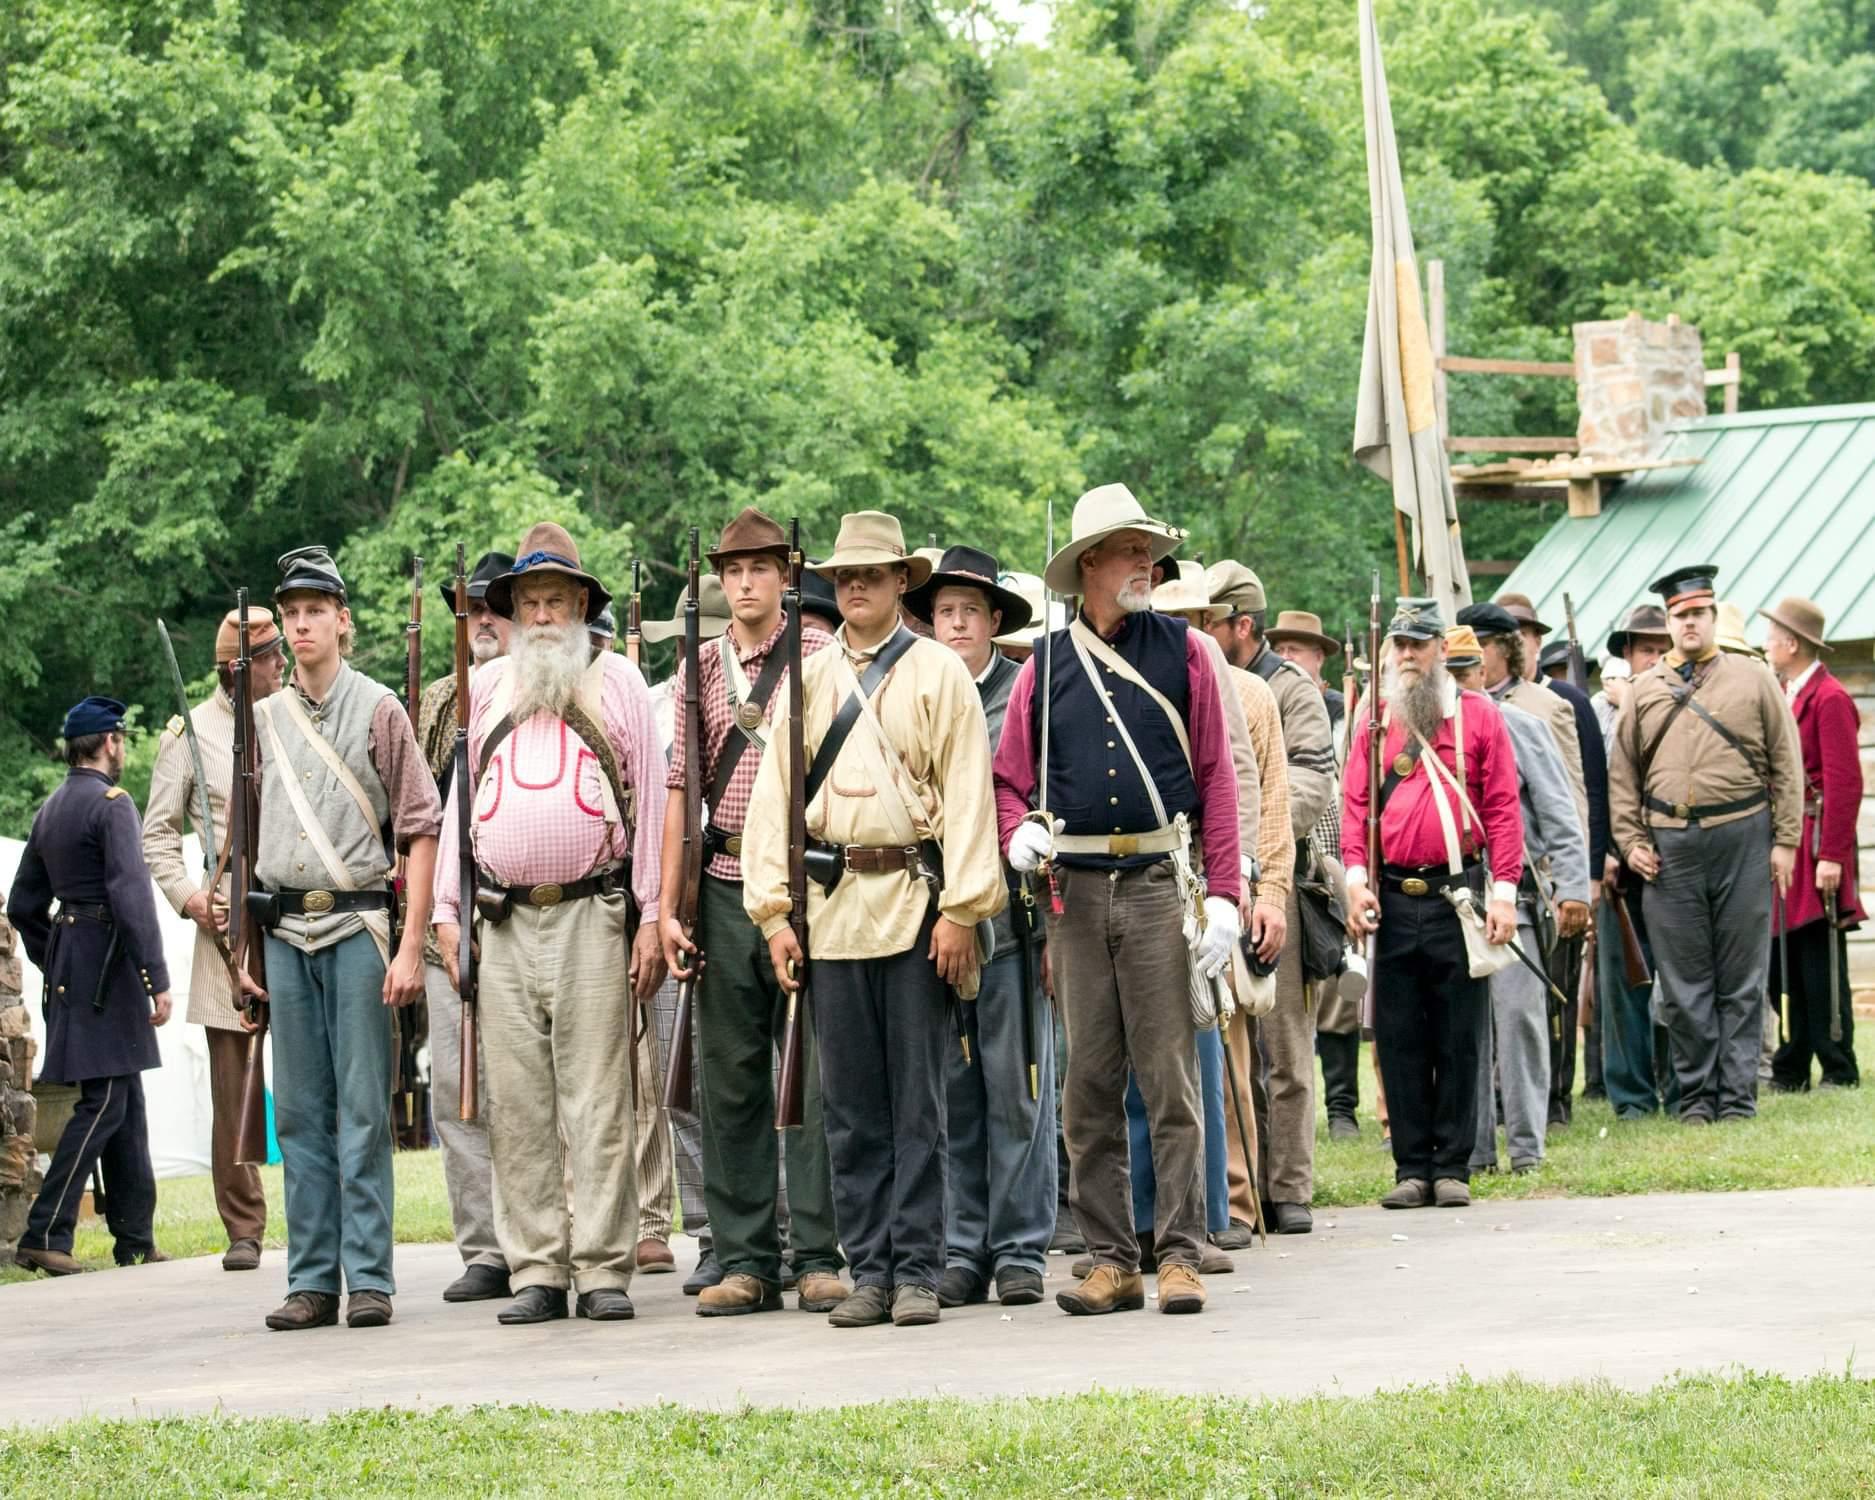 Civil War Re-enactment in Springfield, MO